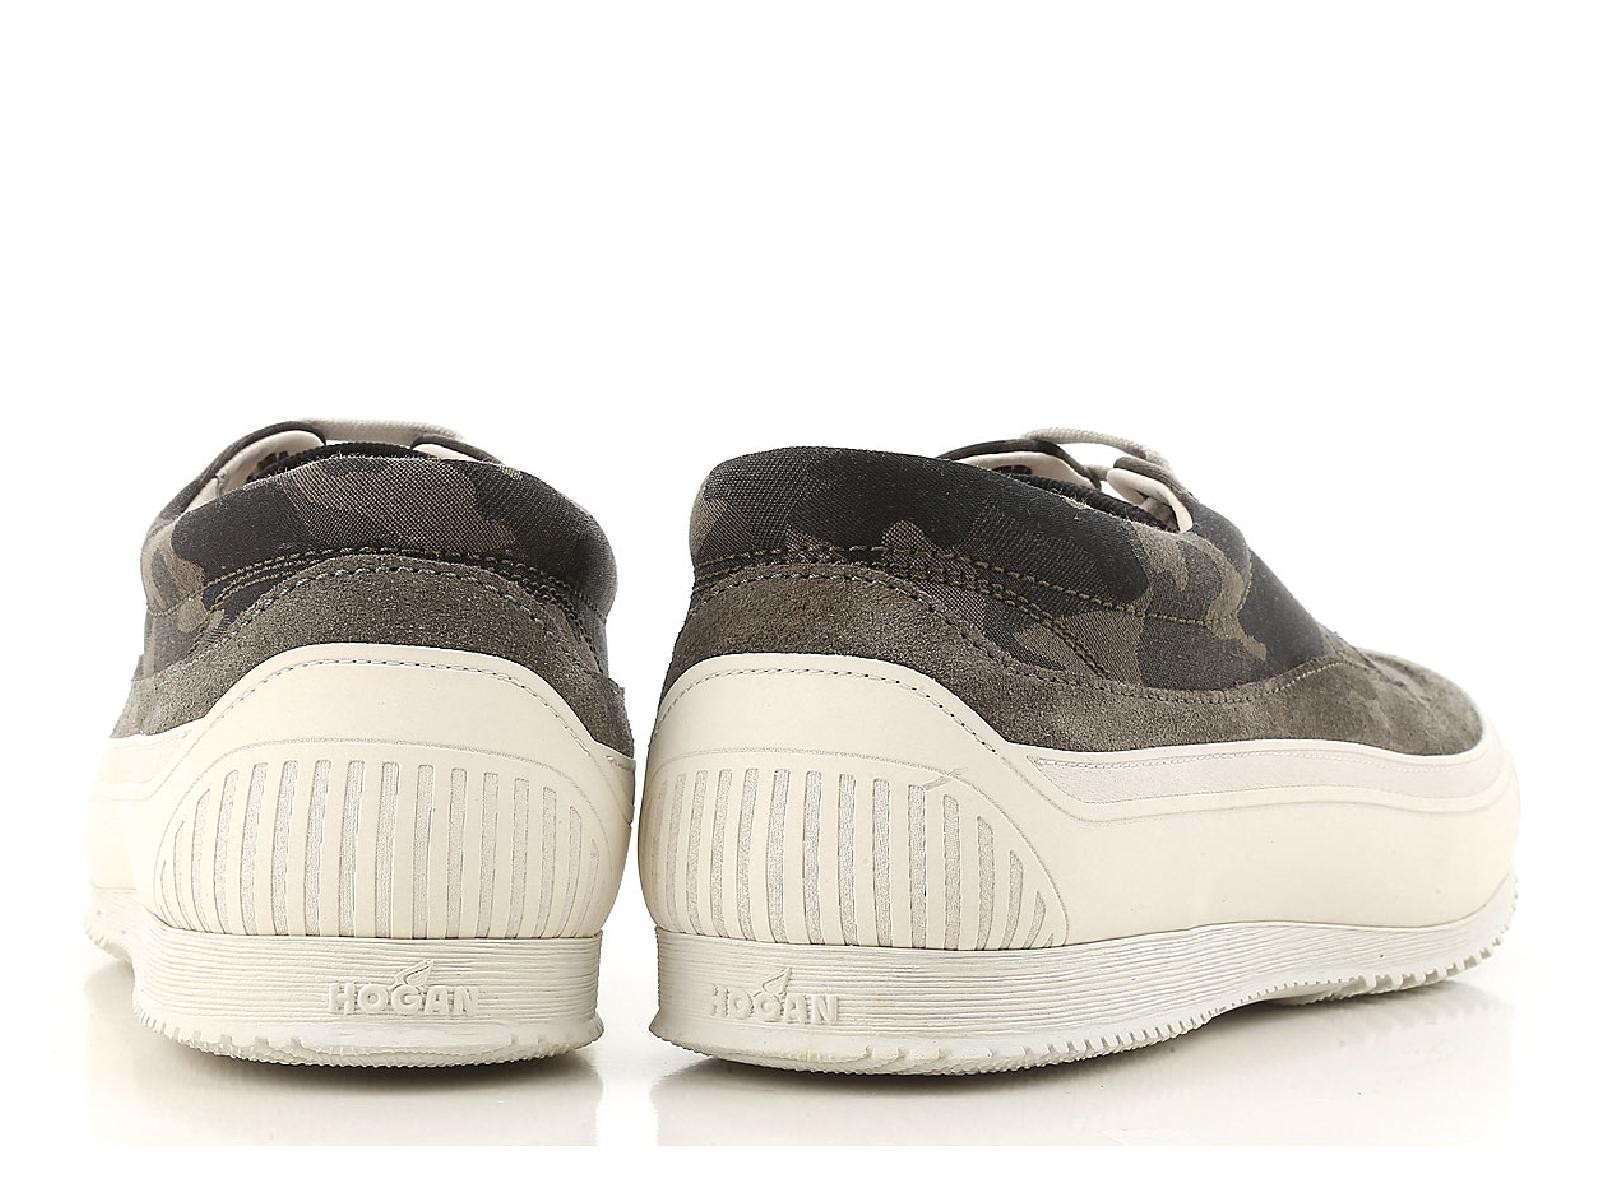 ac310977c3e72 Hogan men's low top fashion sneakers shoes camouflage fabric white ...